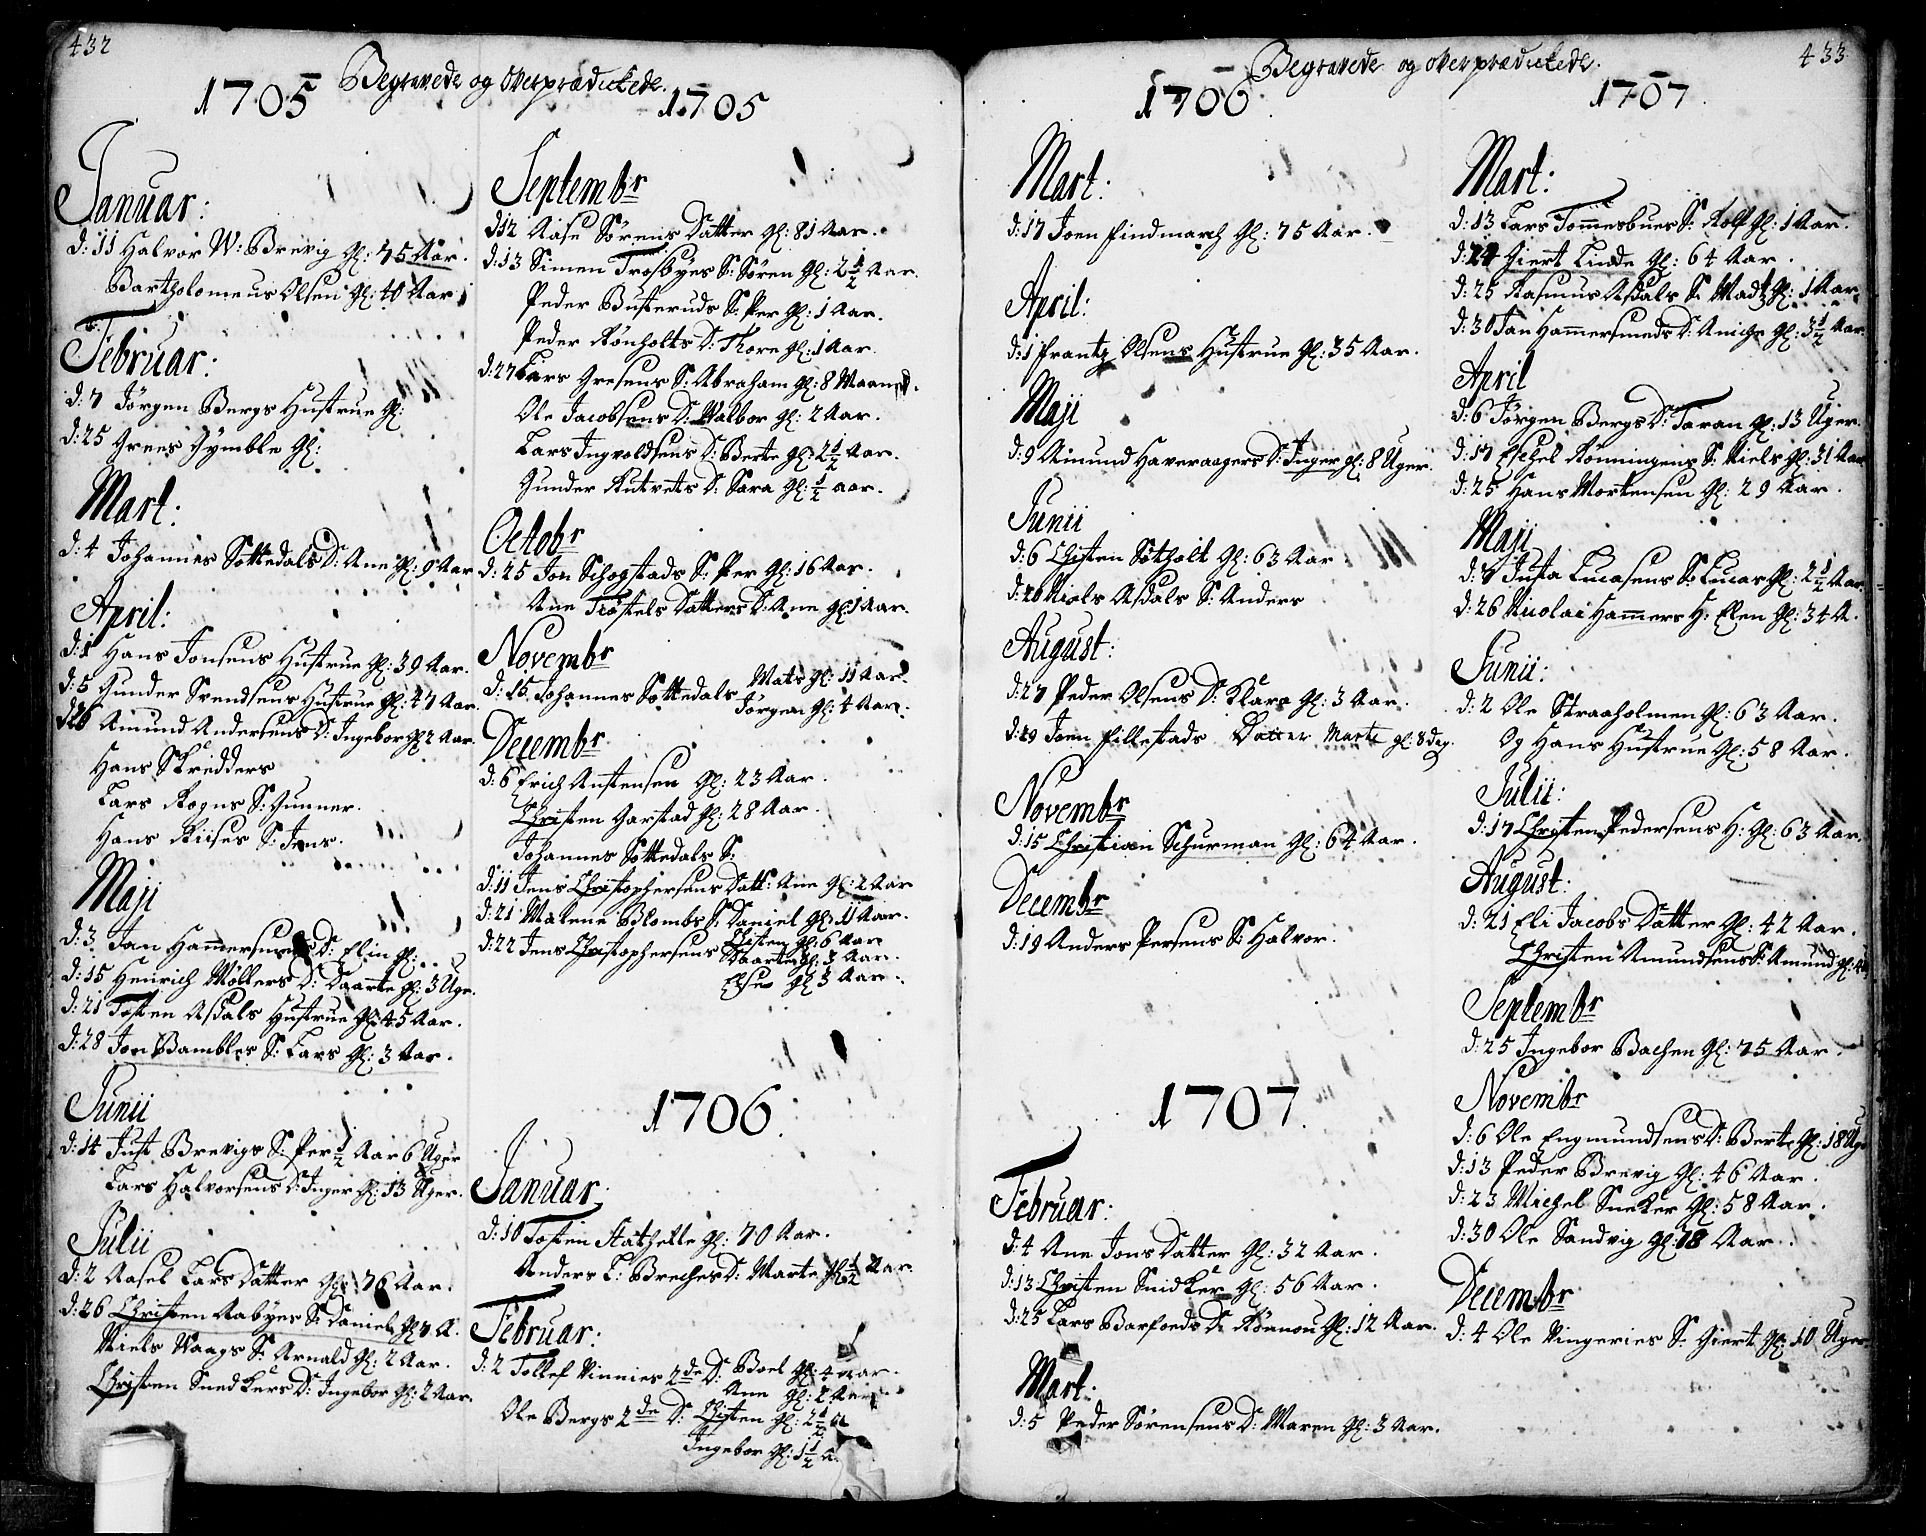 SAKO, Bamble kirkebøker, F/Fa/L0001: Ministerialbok nr. I 1, 1702-1774, s. 432-433